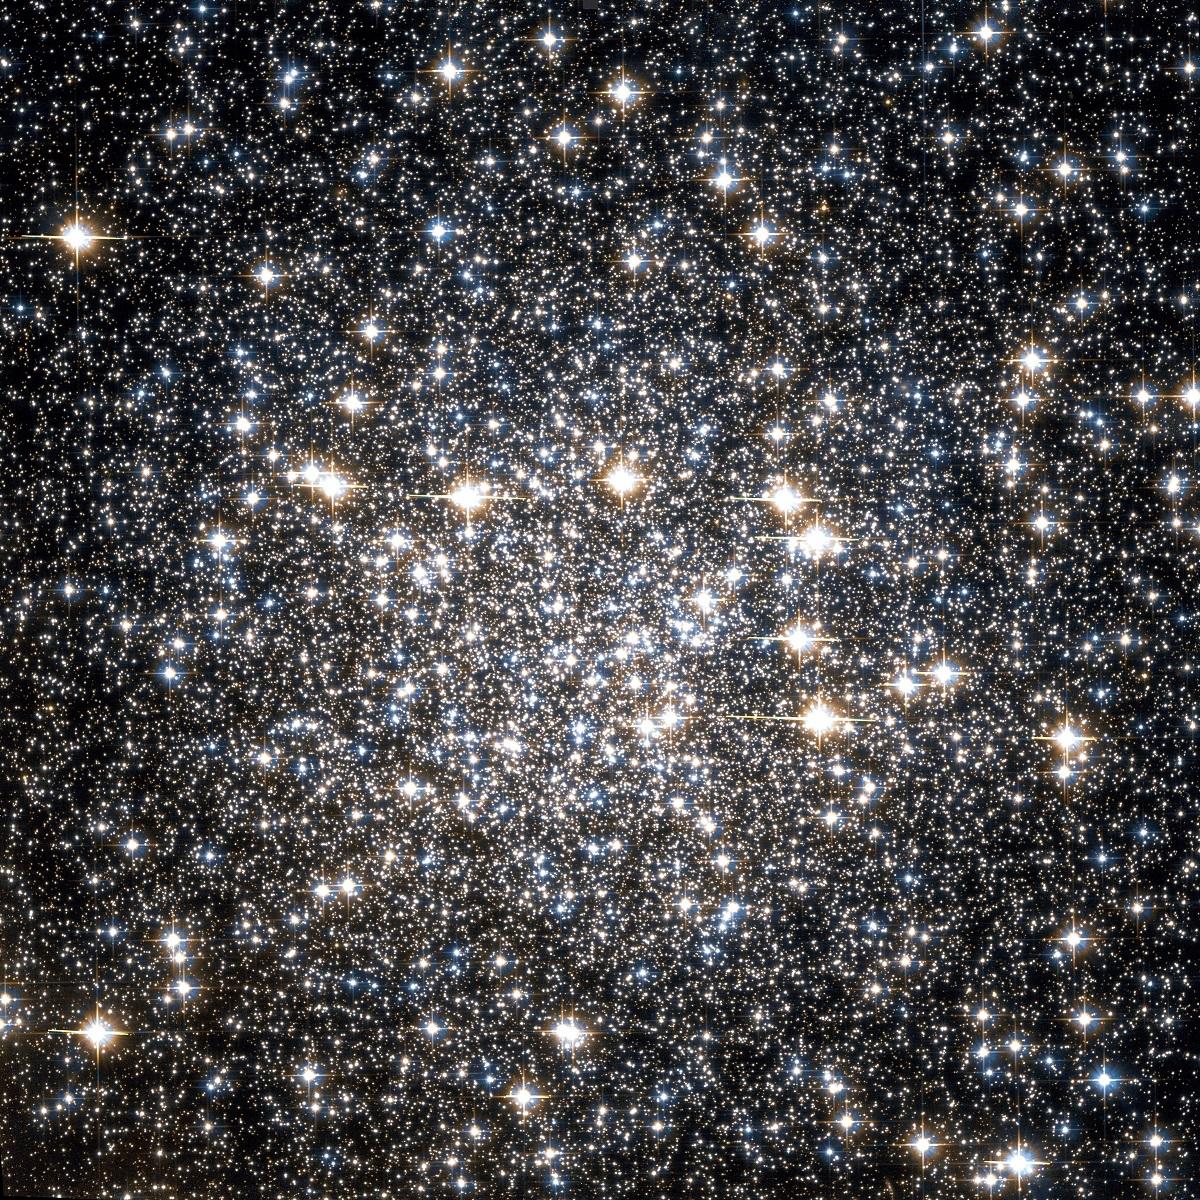 il globular cluster $NGC$ 4833